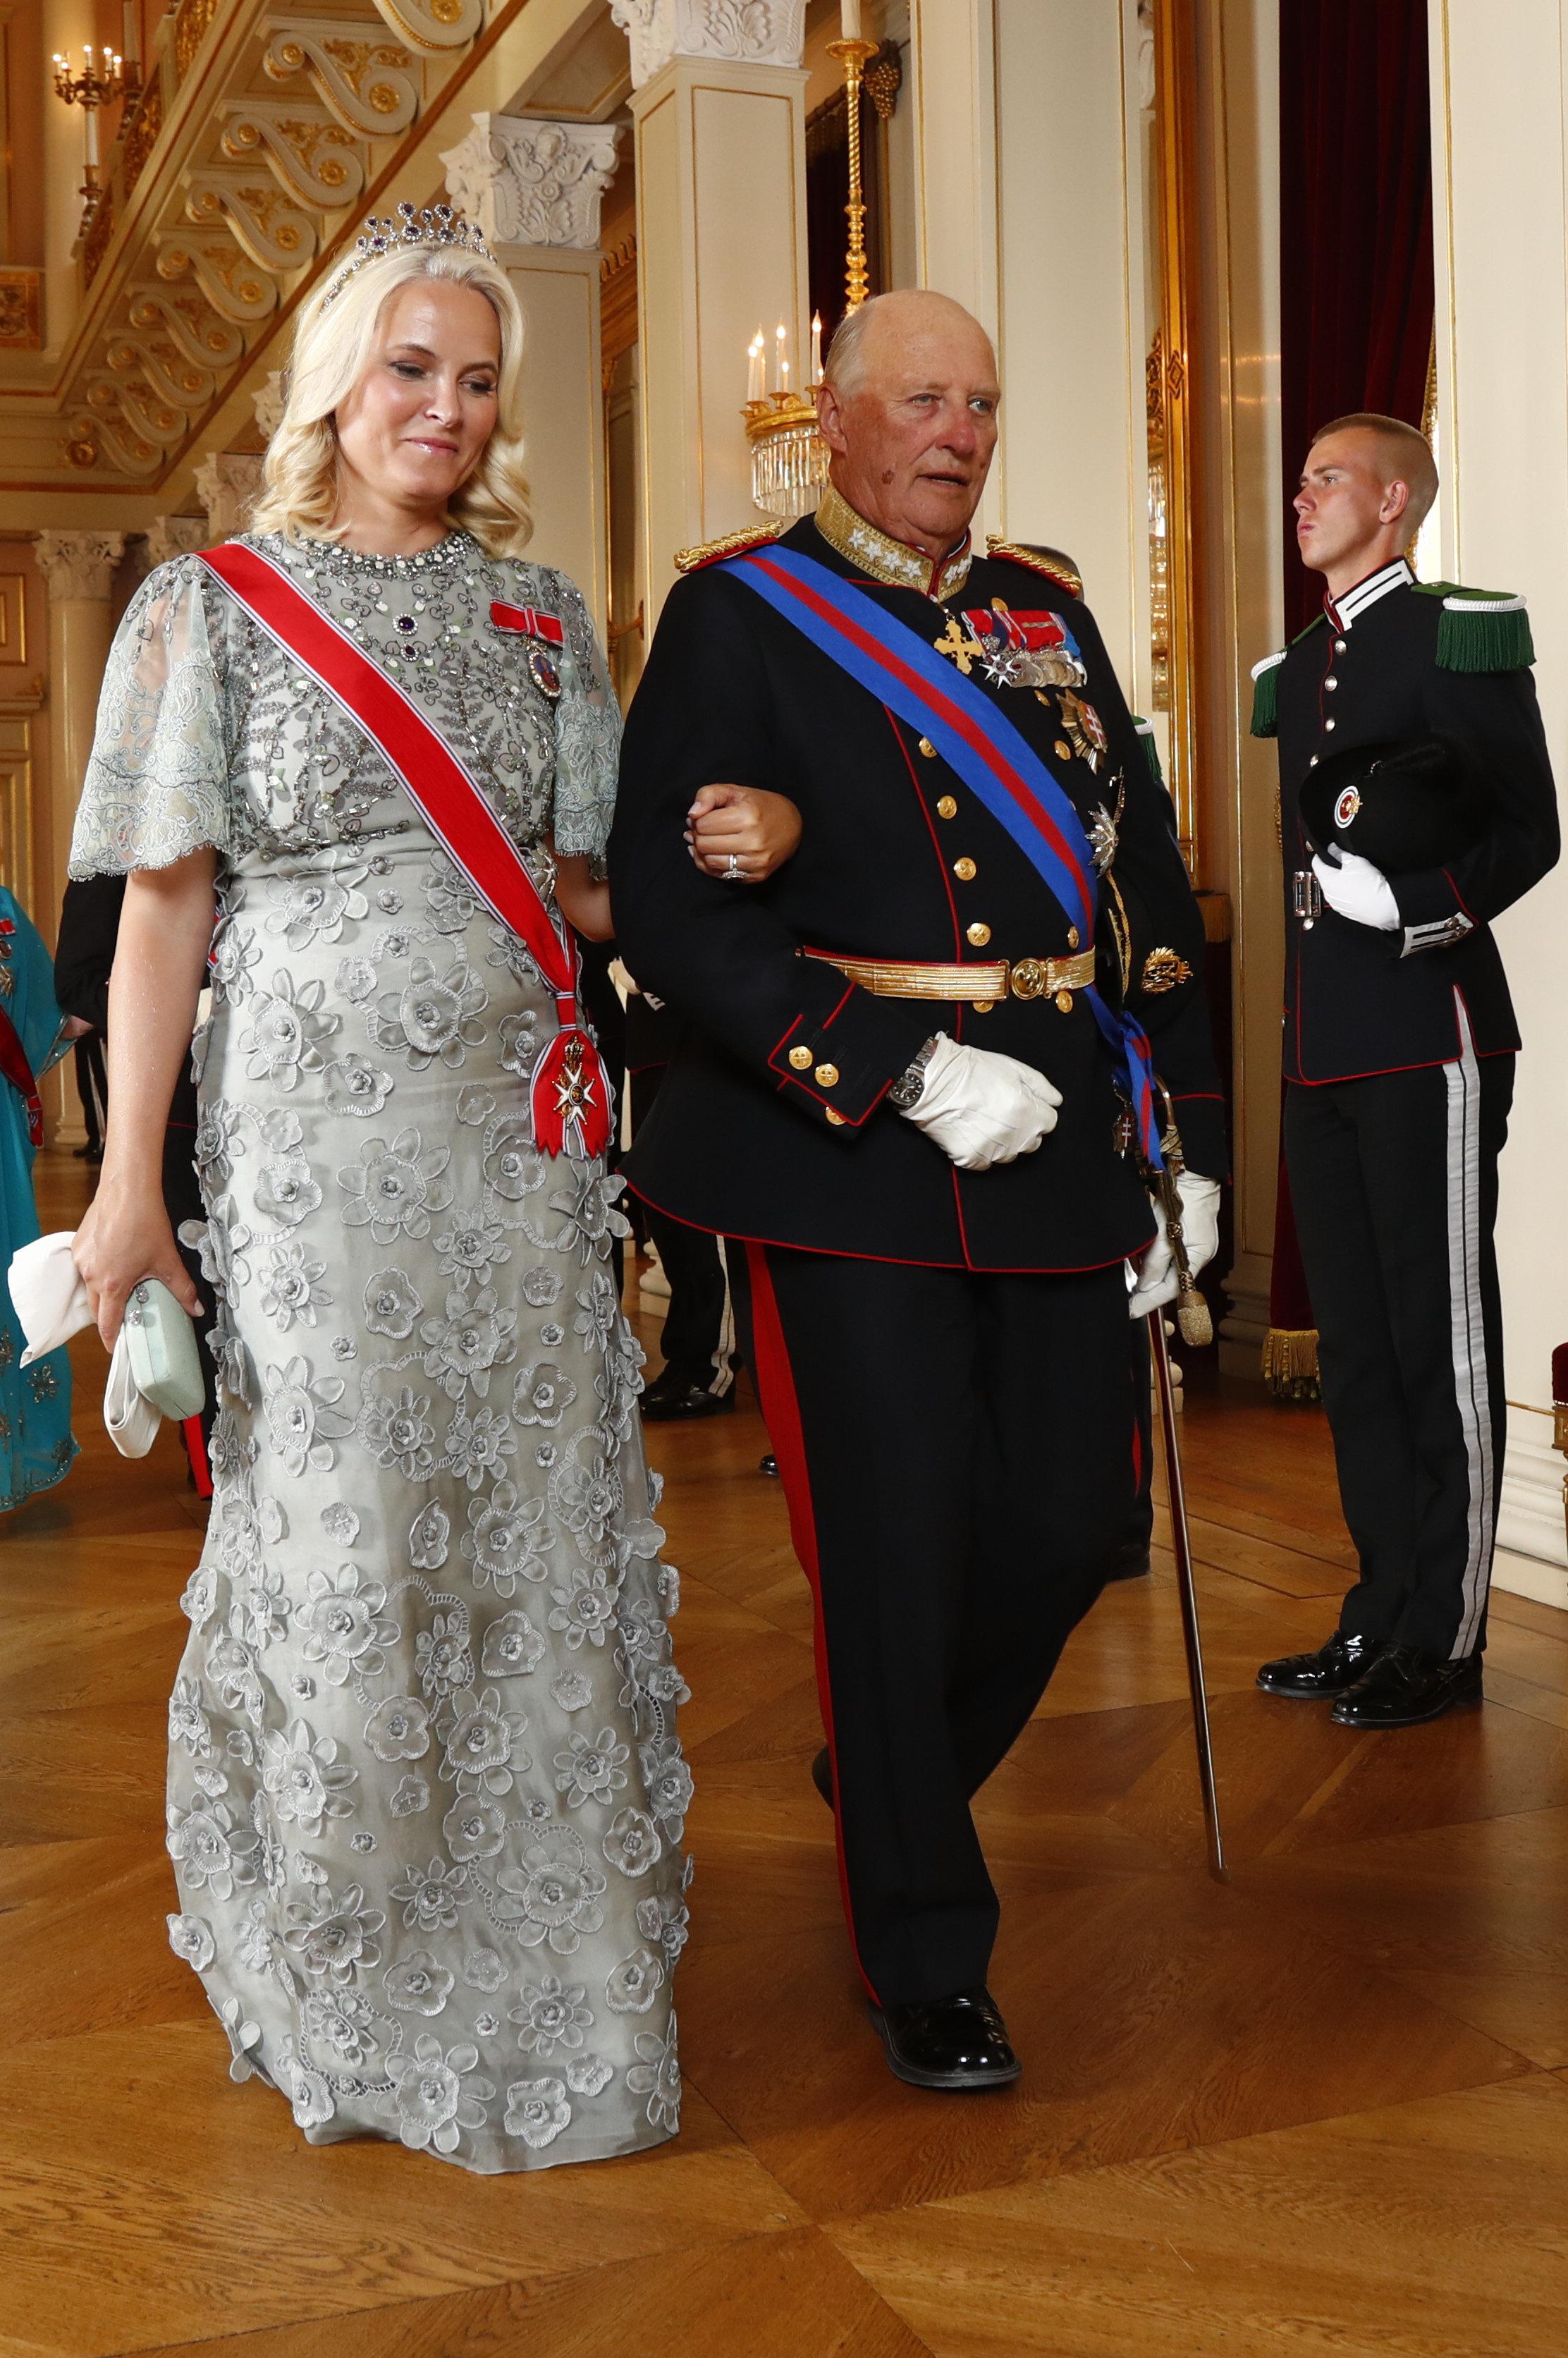 La princesa Mette-Marit junto a su suegro. (Dana Press)